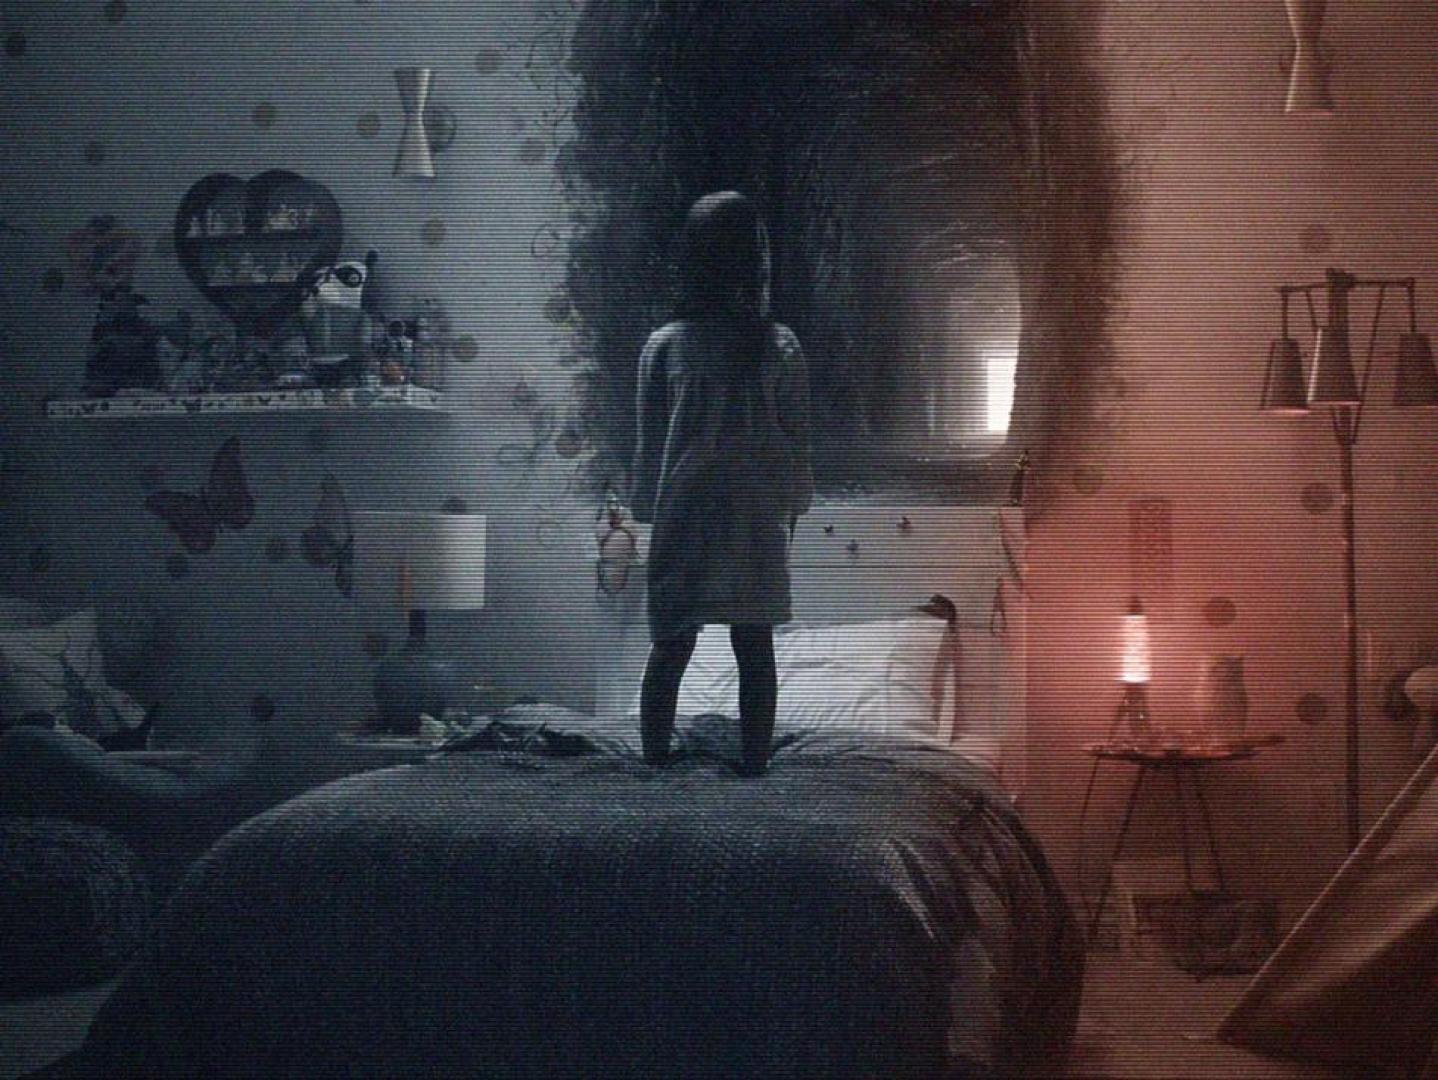 Paranormal Activity: The Ghost Dimension - Parajelenségek: Szellemdimenzió (2015) 2. kép